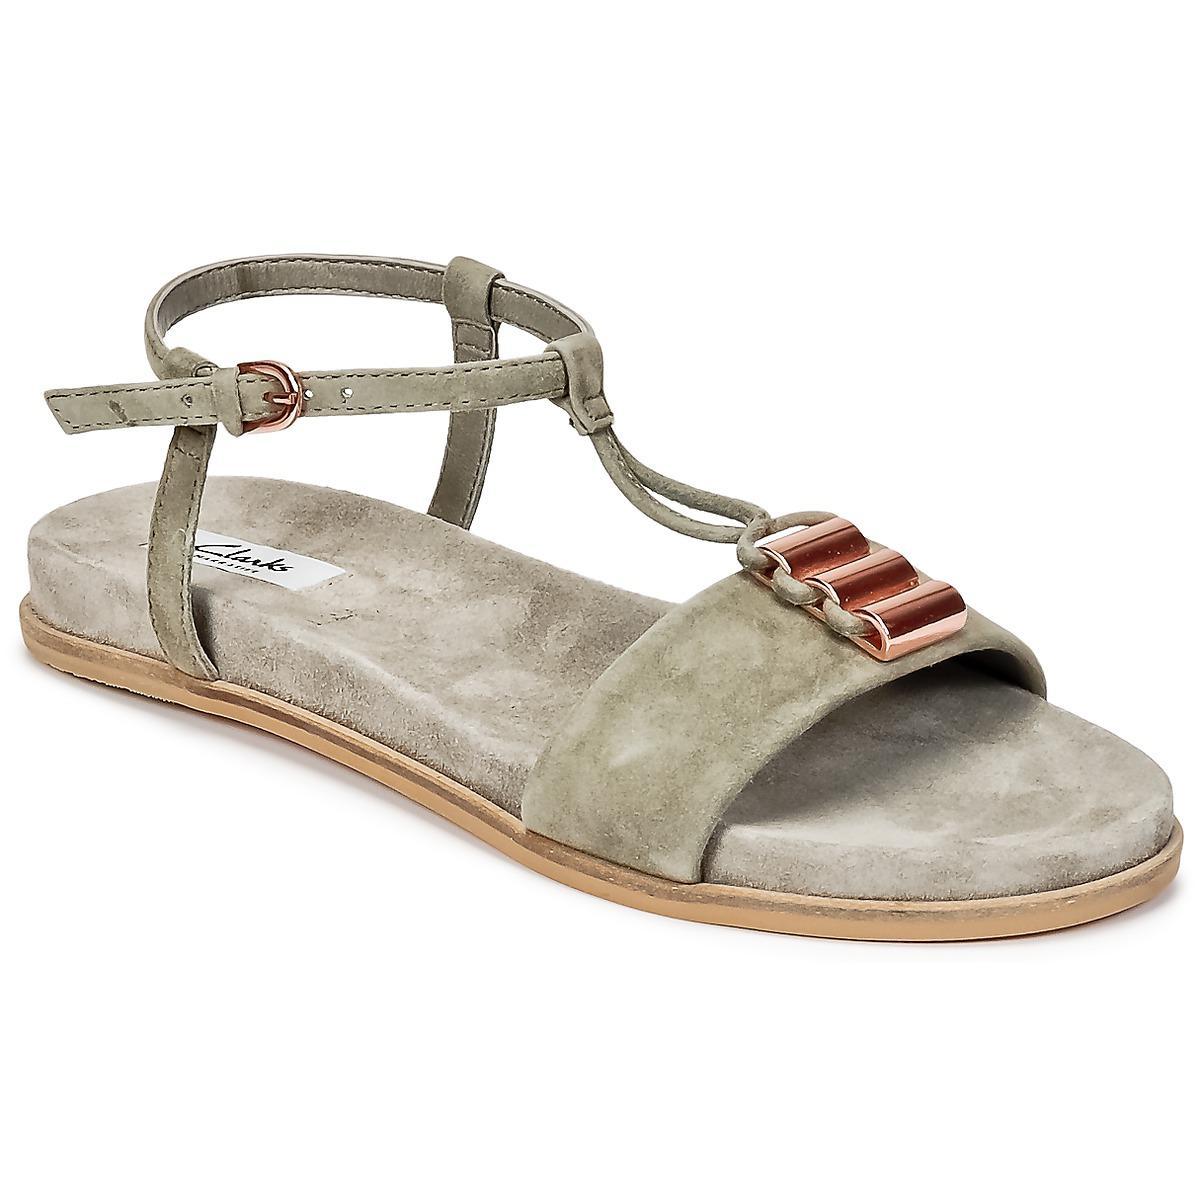 e9a3baf5de8 Clarks Agean Cool Sandals in Gray - Lyst